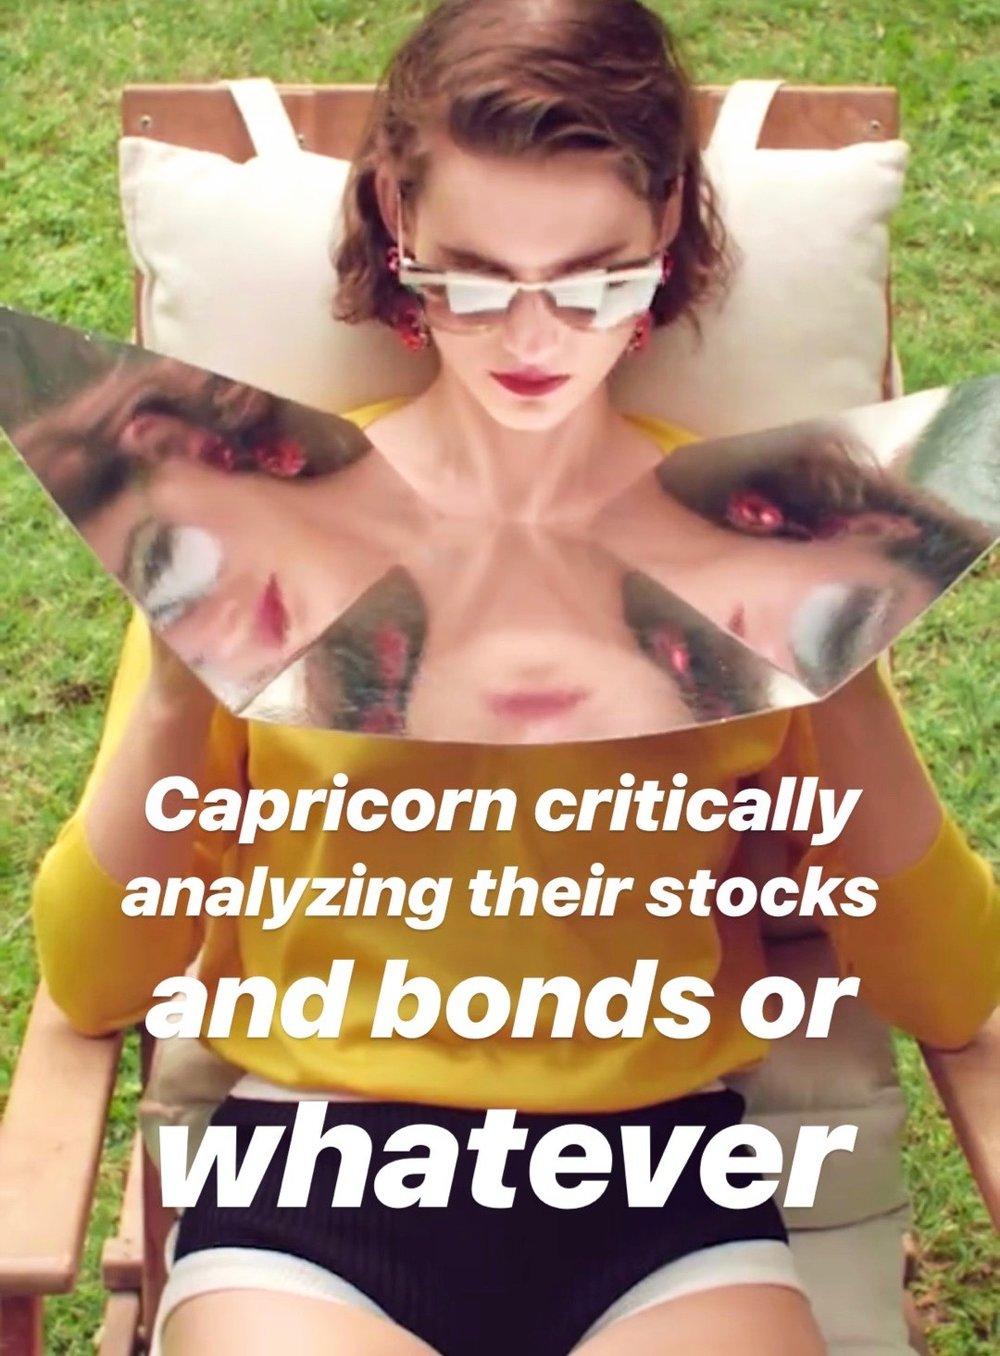 TBP_Musing_Meme_Zodiac_Capricorn.jpg